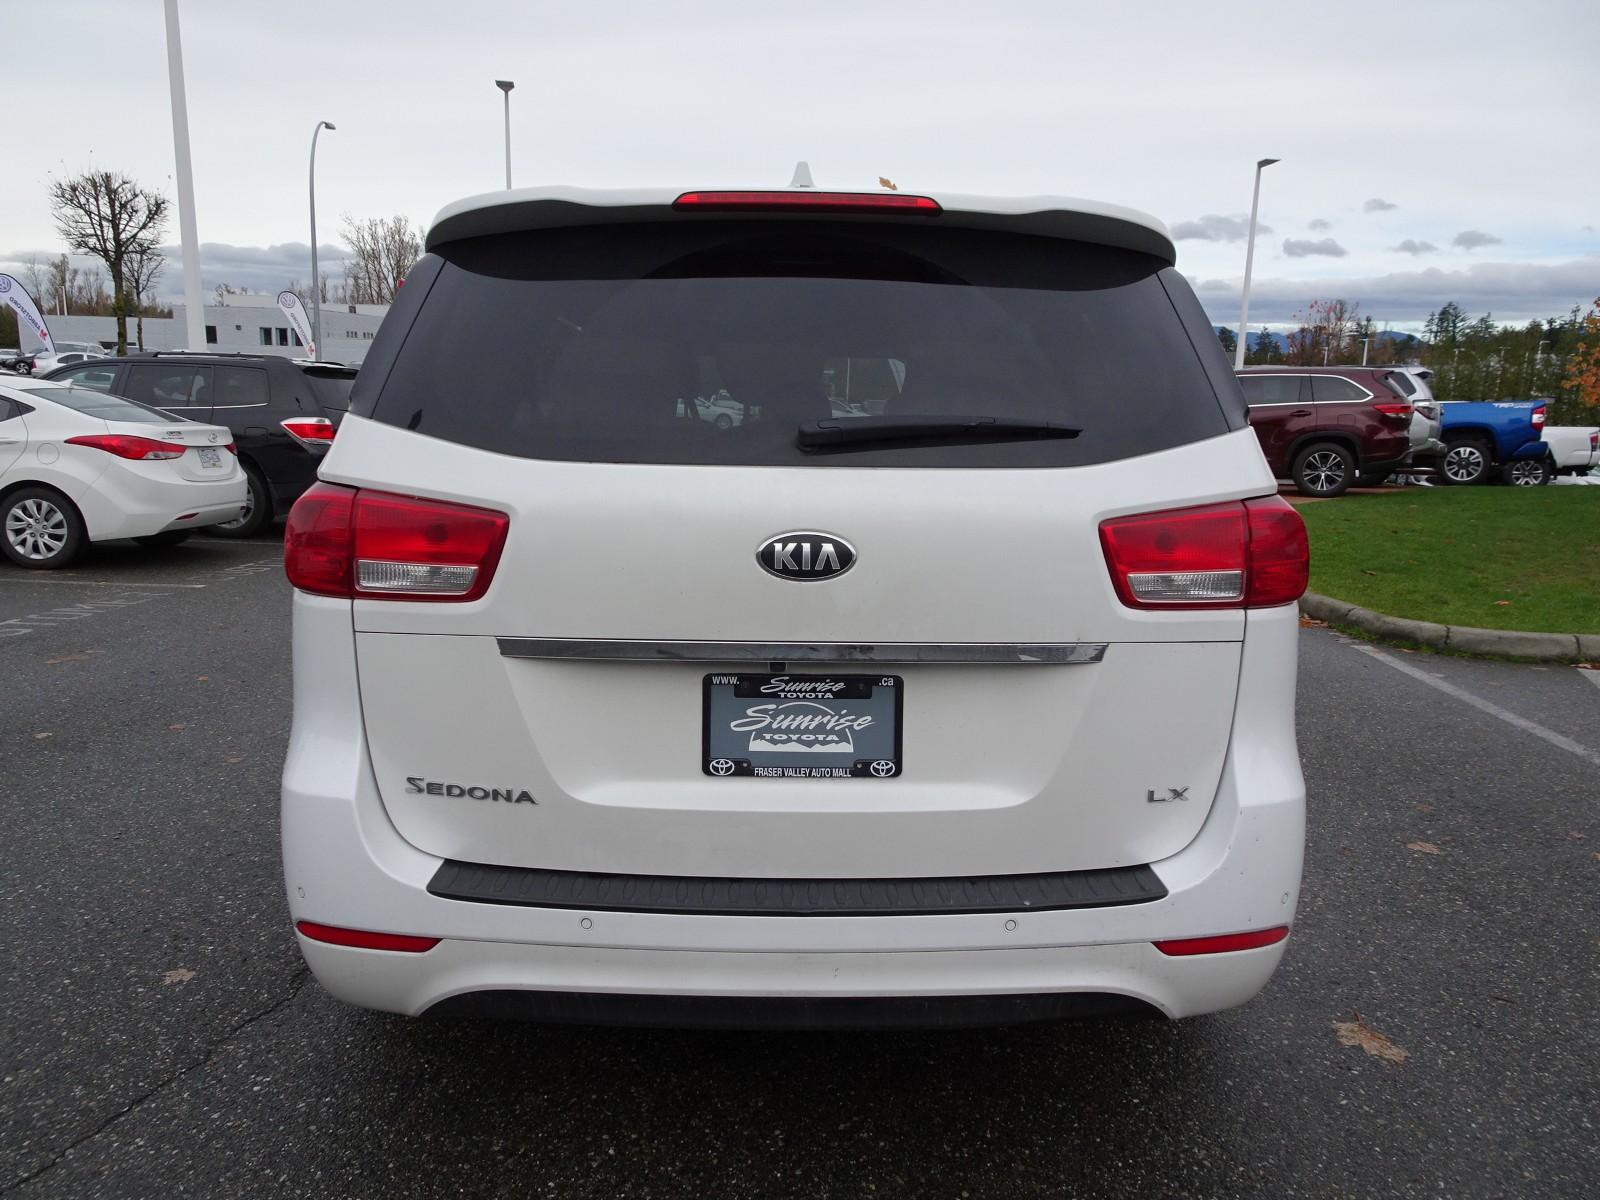 Used 2018 Kia Sedona in Abbotsford,BC